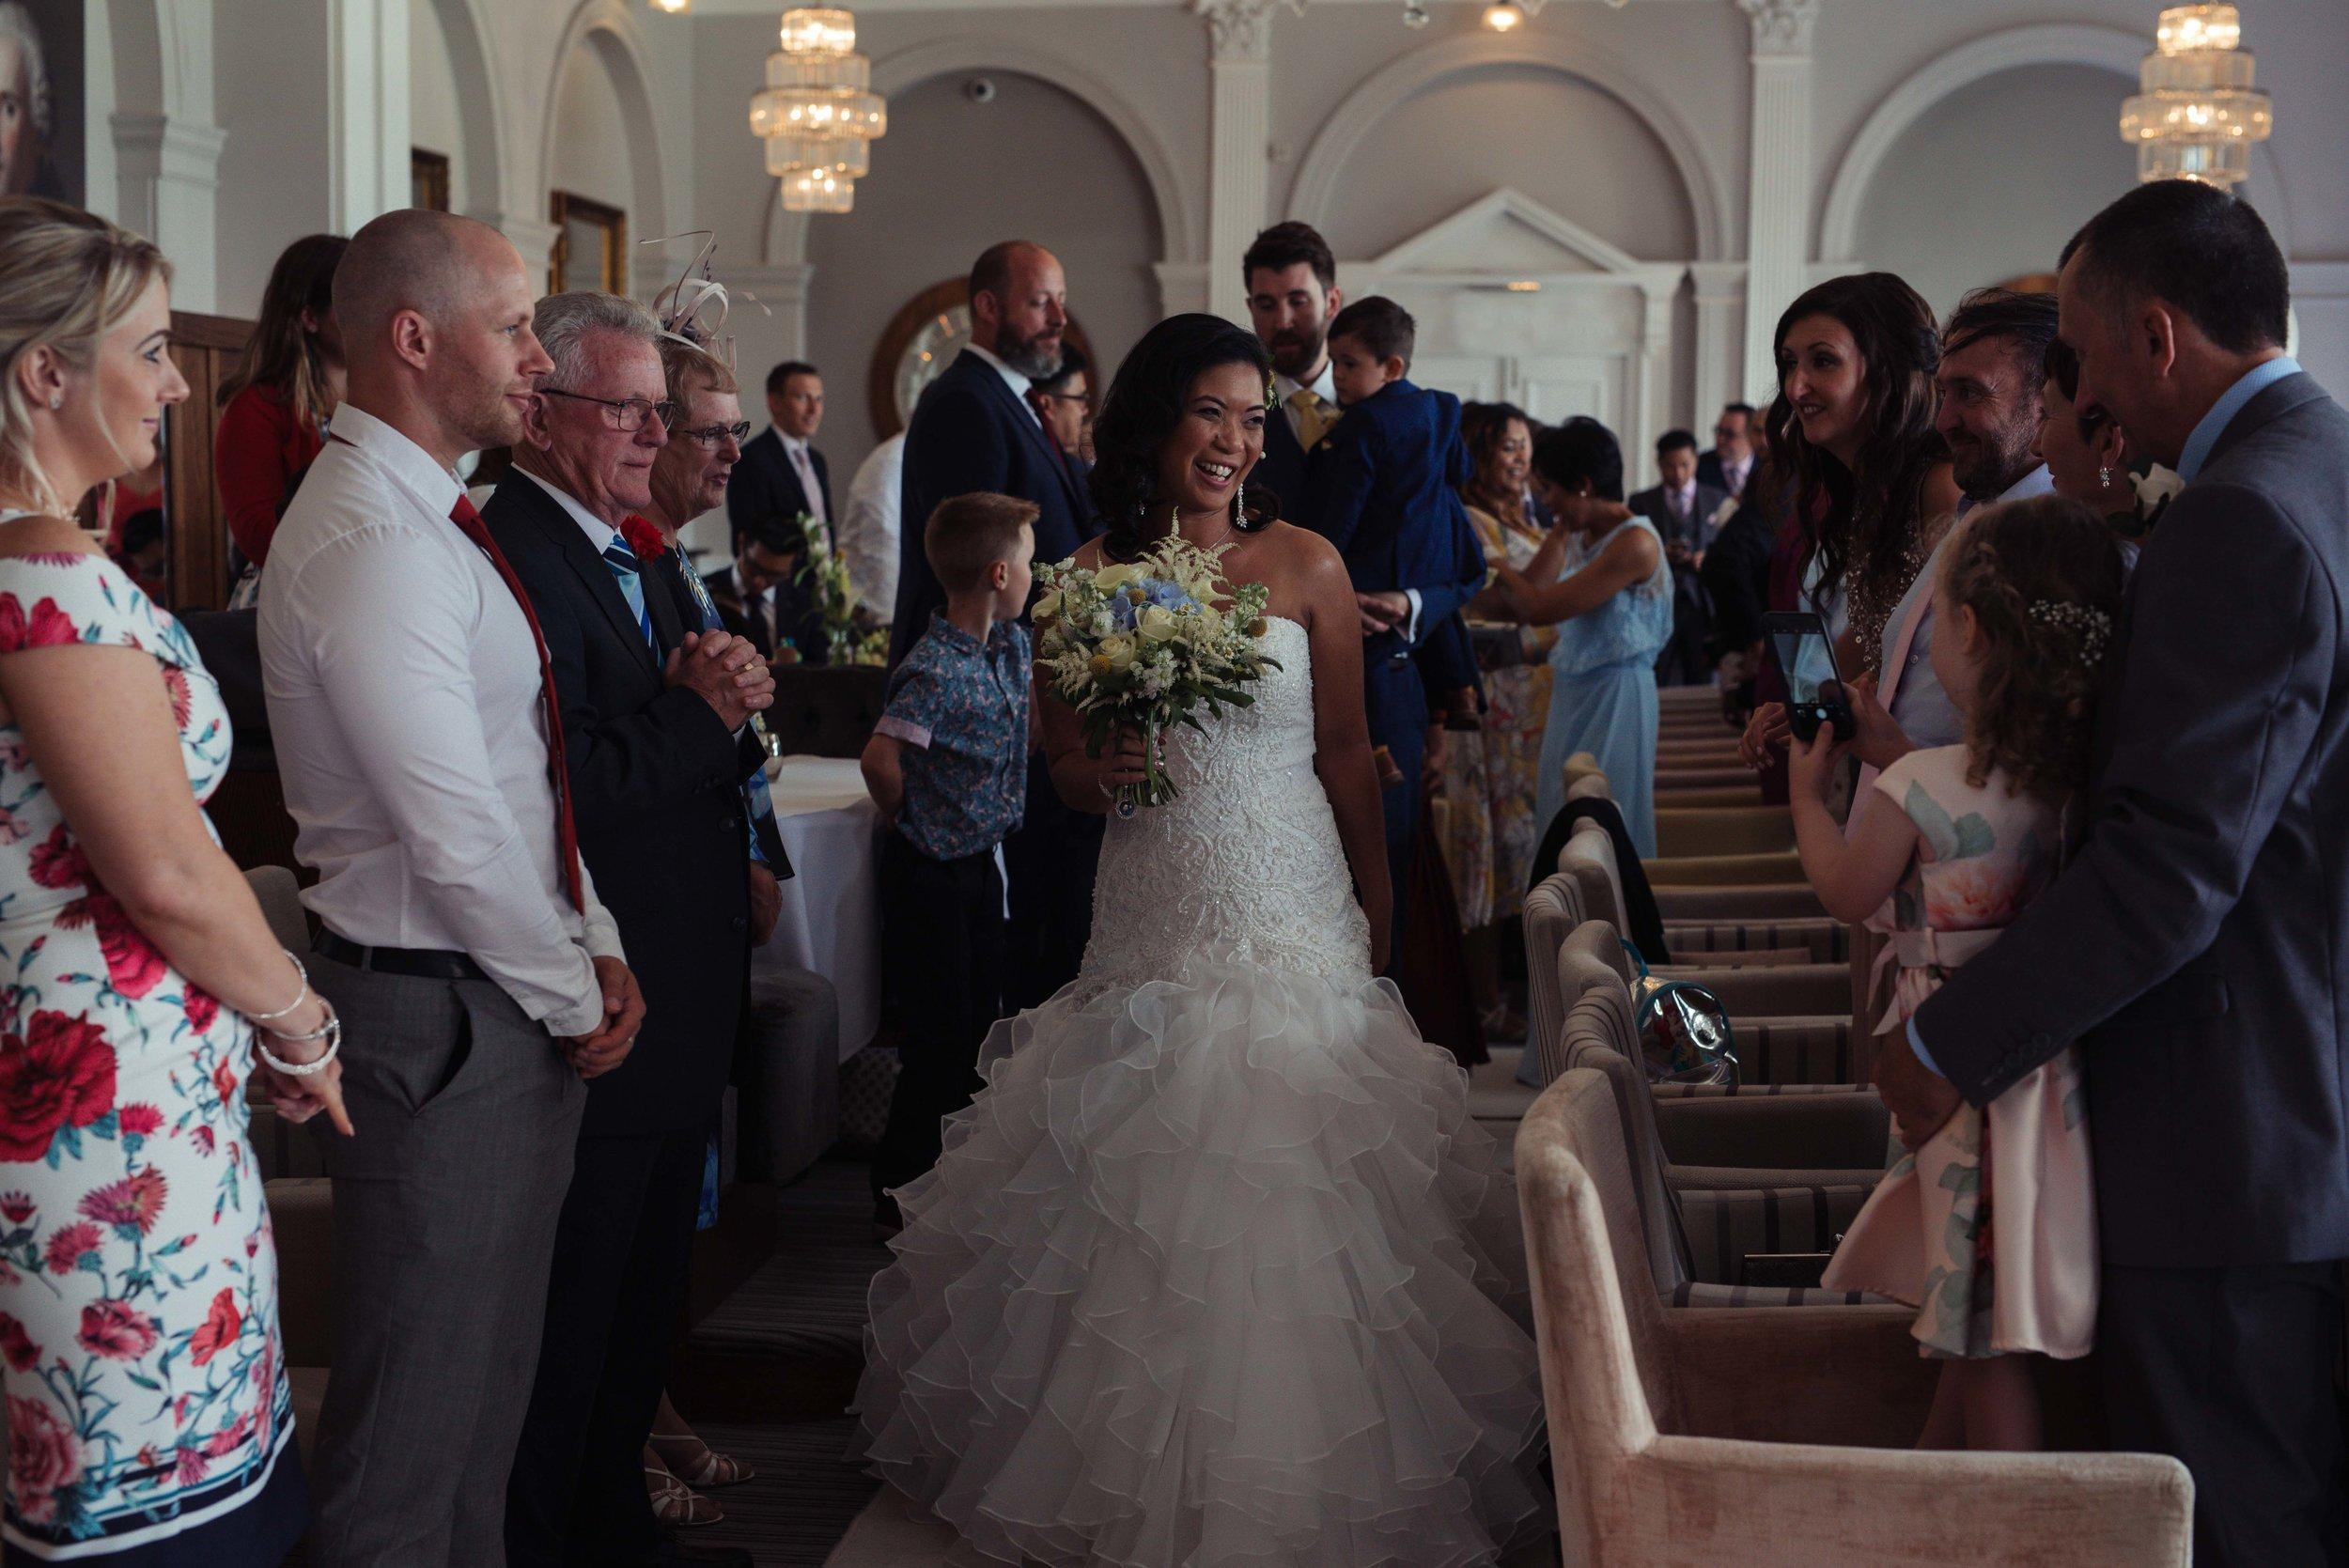 Belsfield Wedding Photography-38.jpg